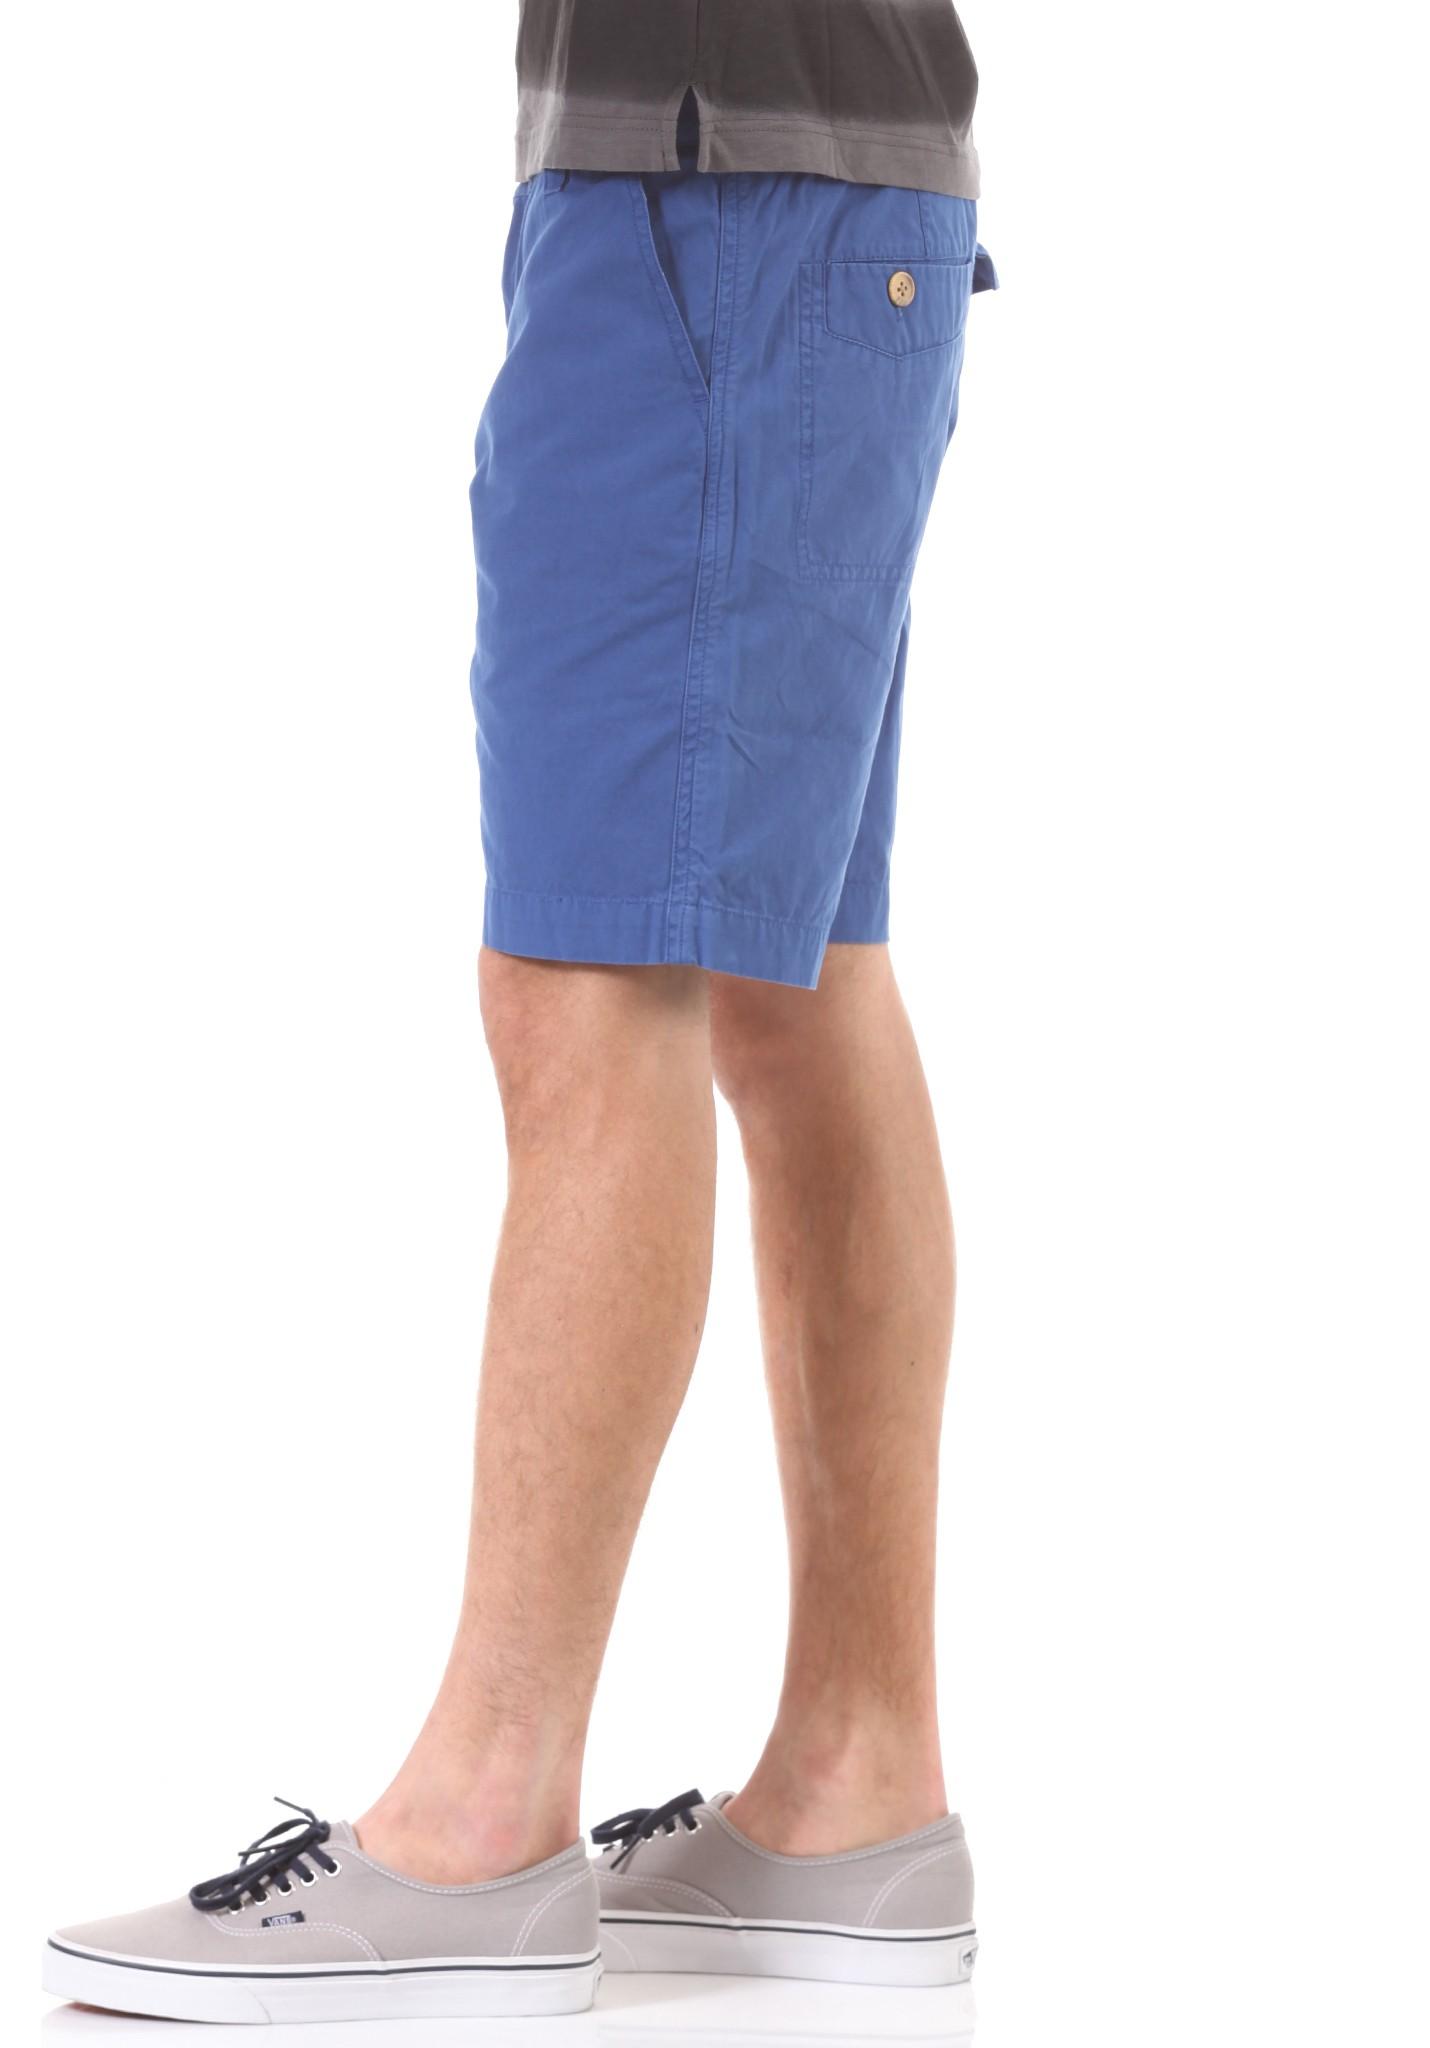 neu ragwear vato herren chino shorts ebay. Black Bedroom Furniture Sets. Home Design Ideas